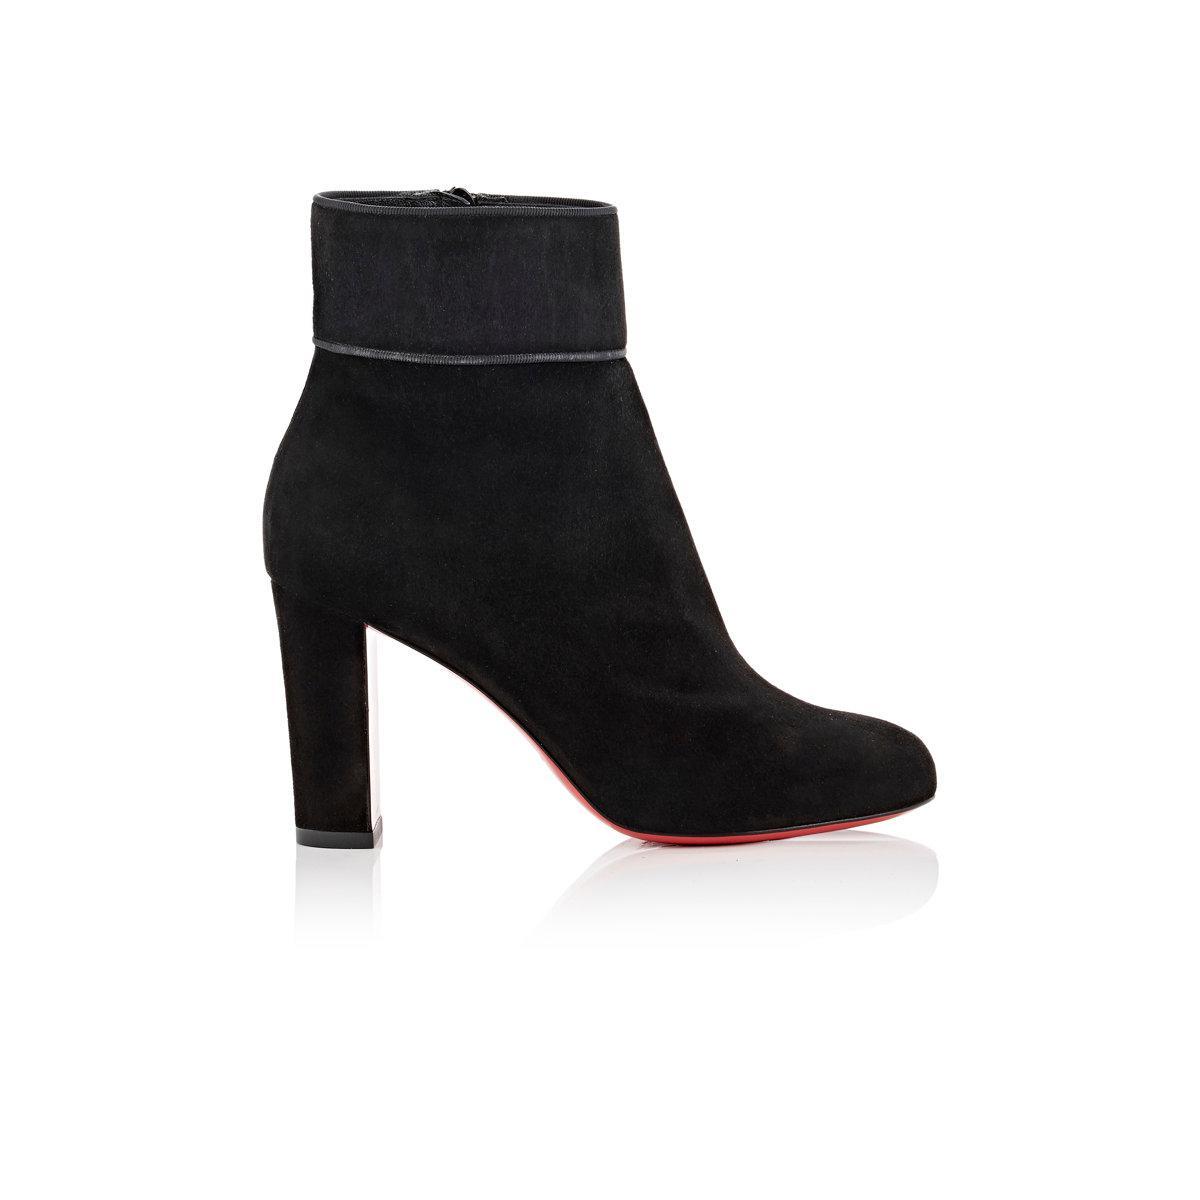 new arrival 3e71d 3a9f3 Women's Black Moulamax Suede Ankle Boots